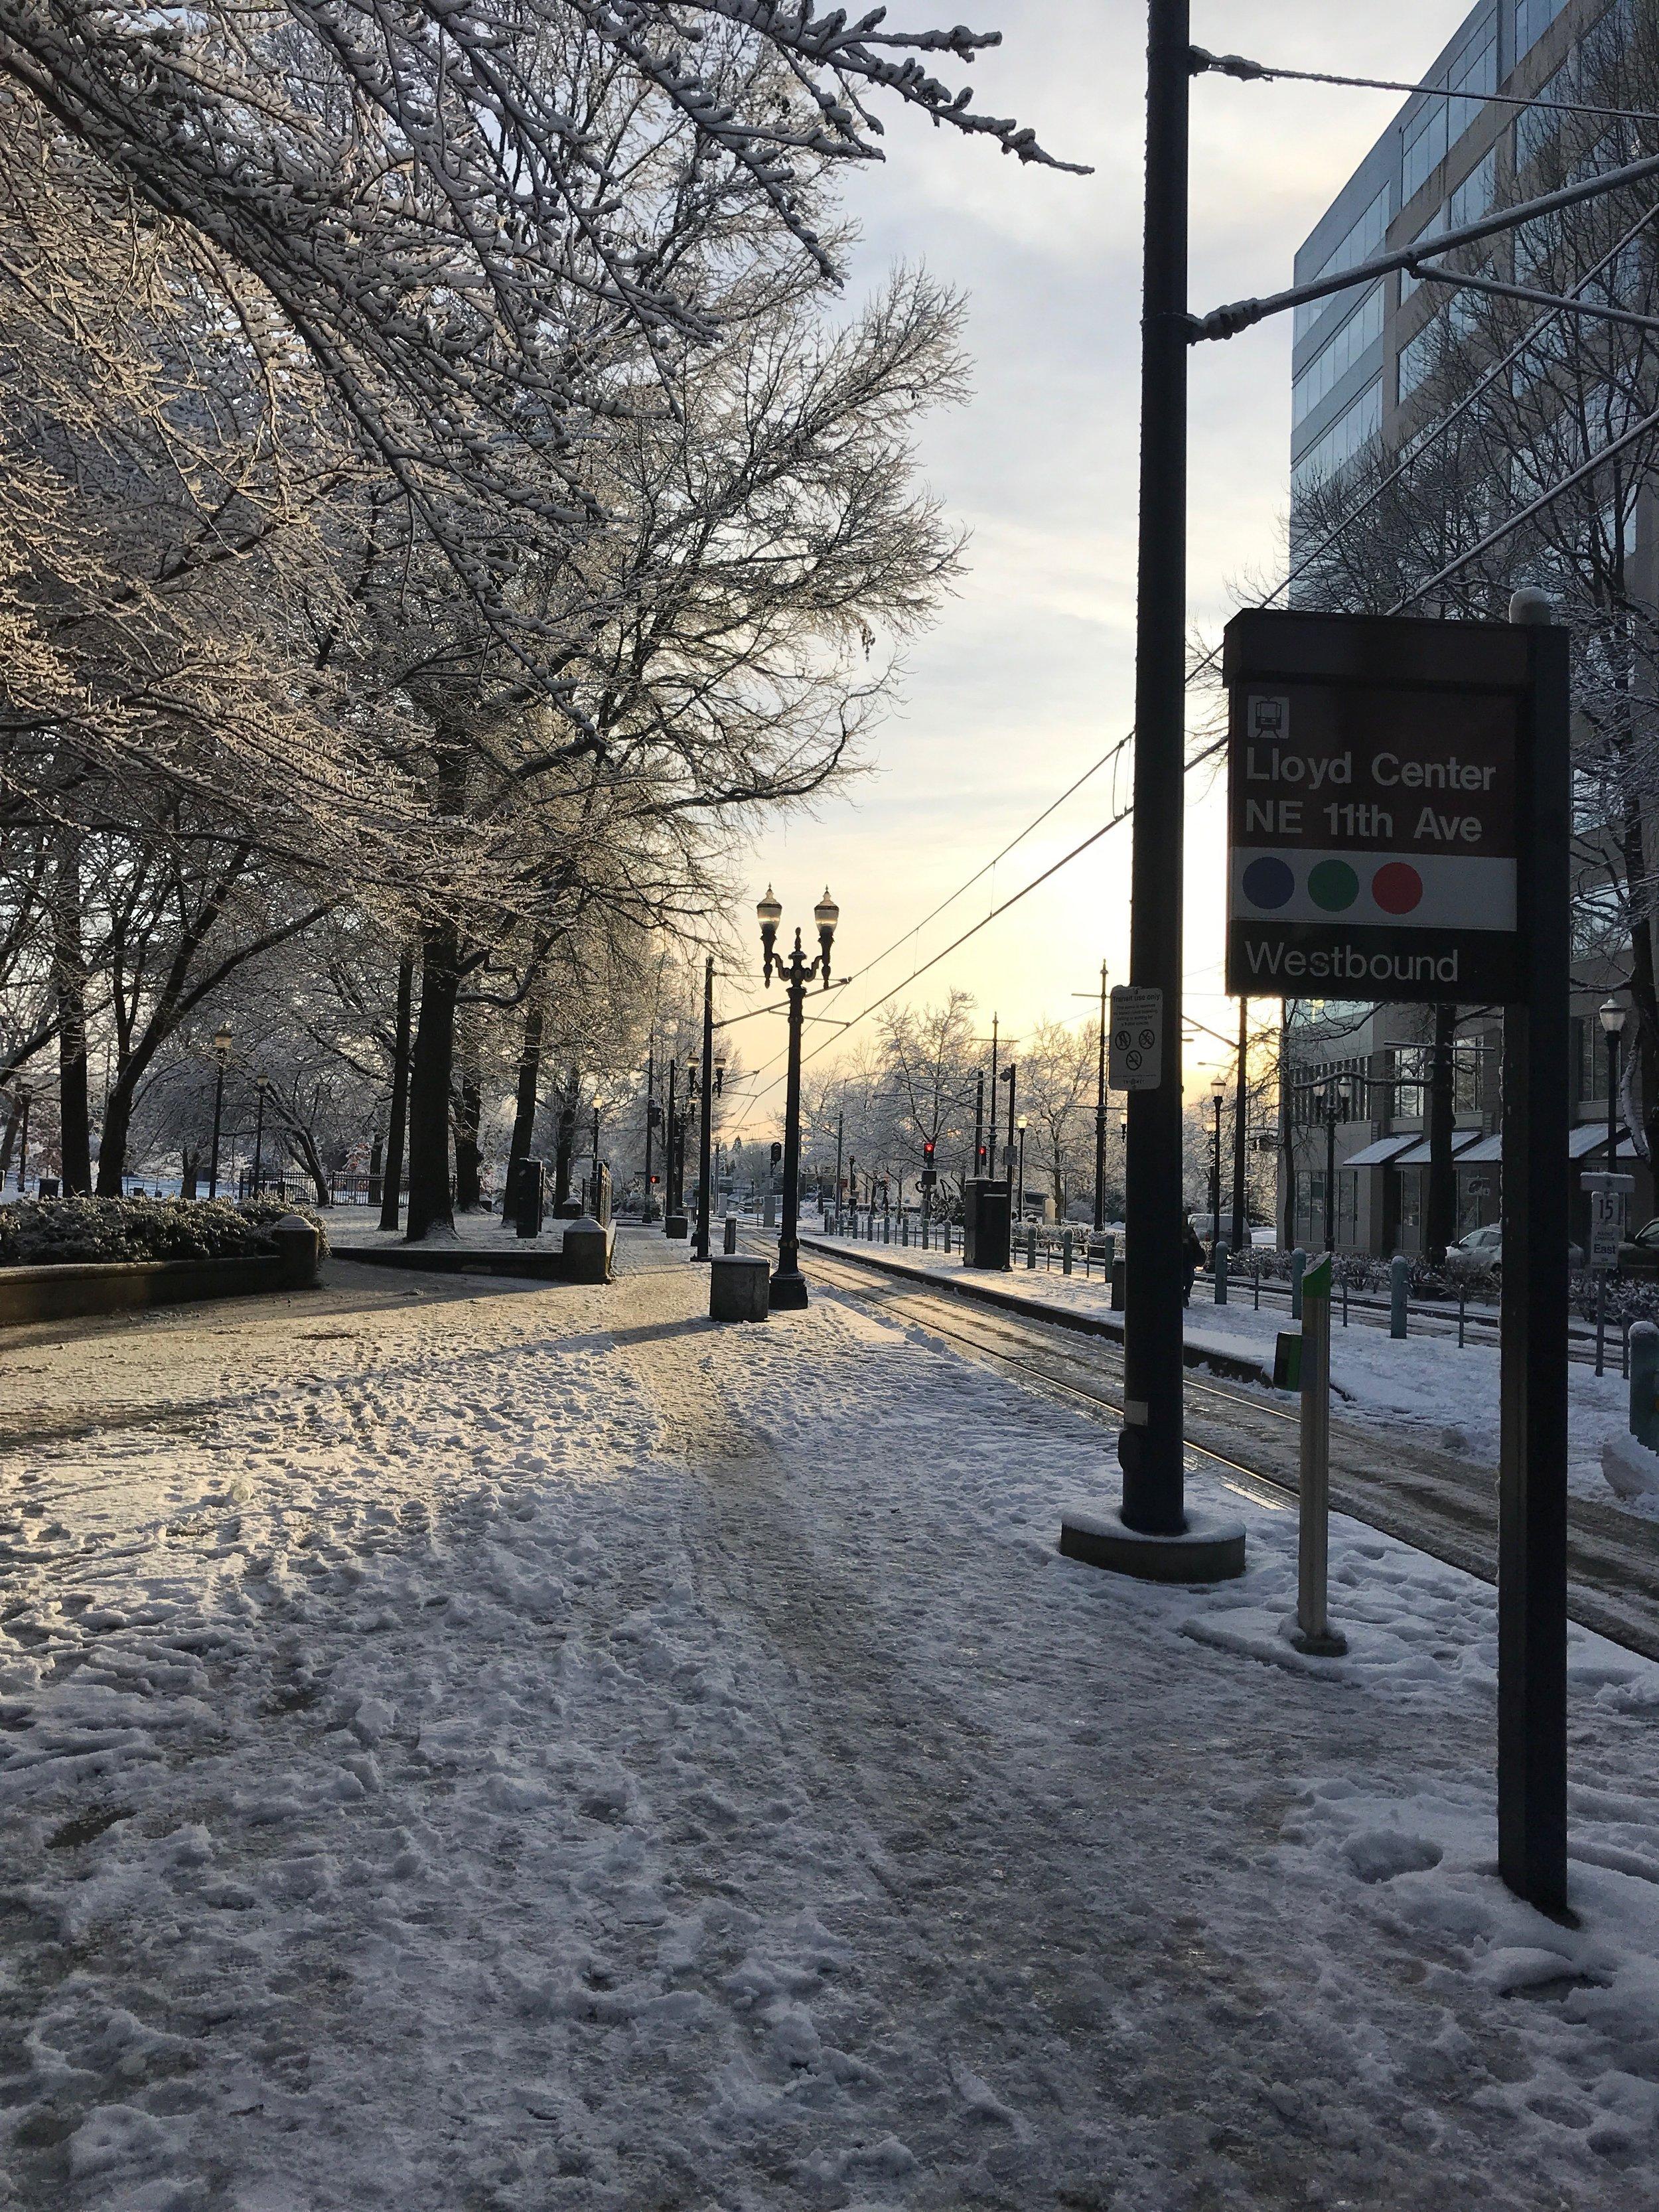 A rare, snowy day in Portland, OR.